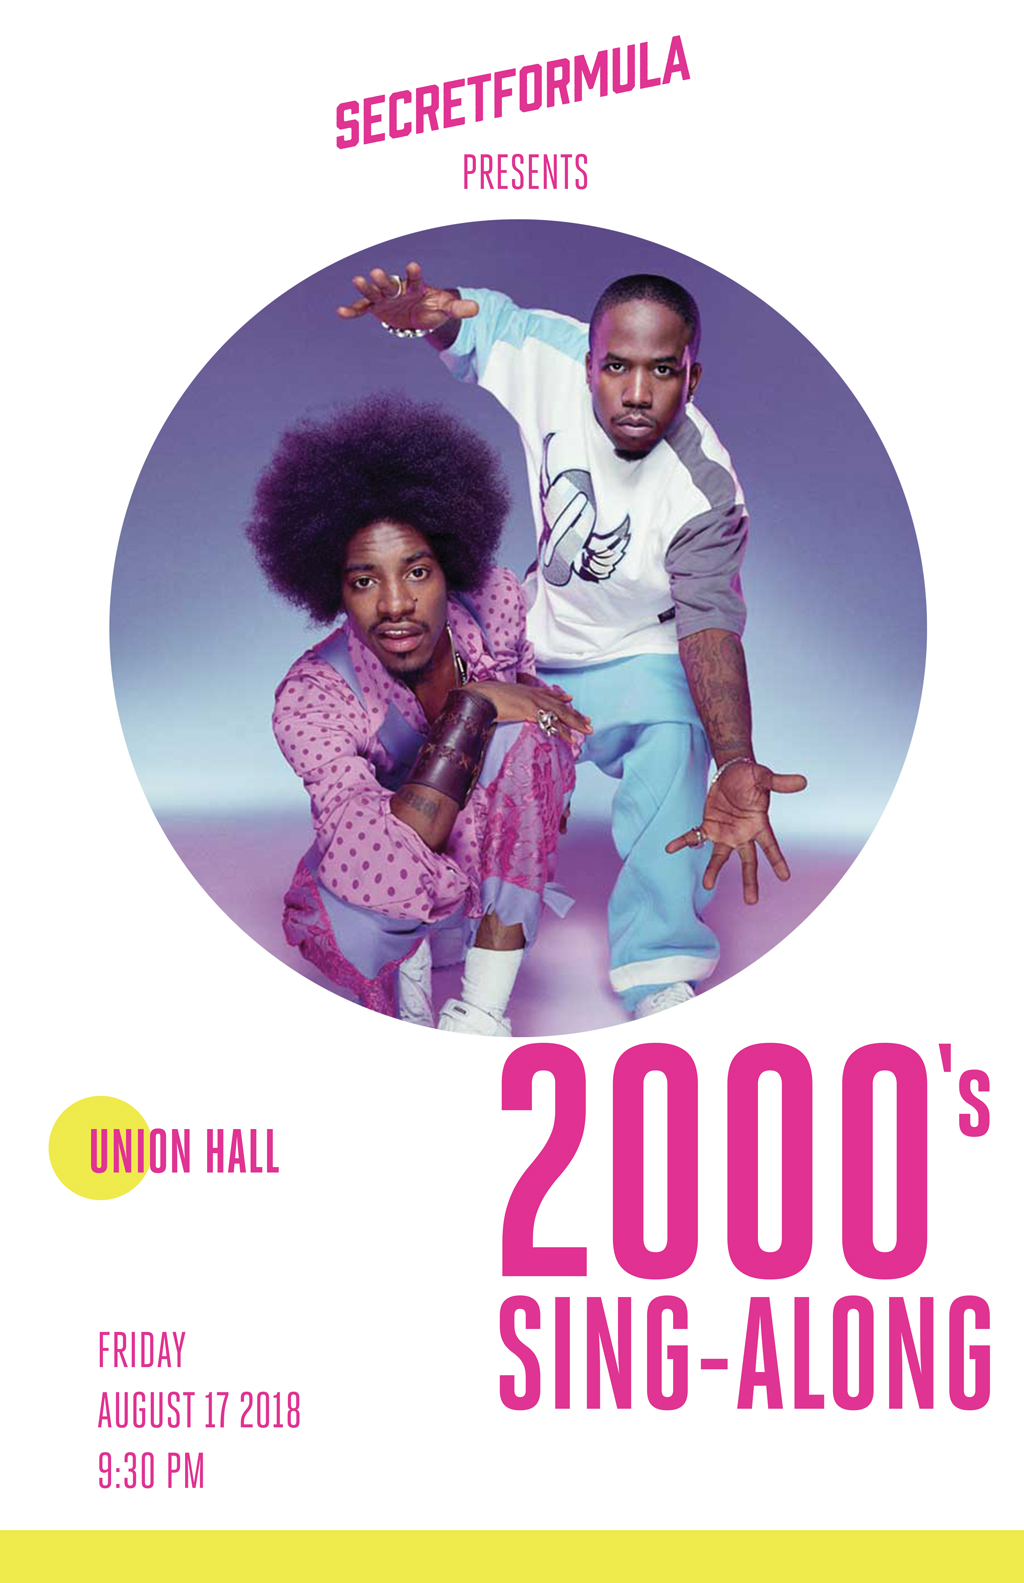 The 2000's Sing-Along - Brokelyn